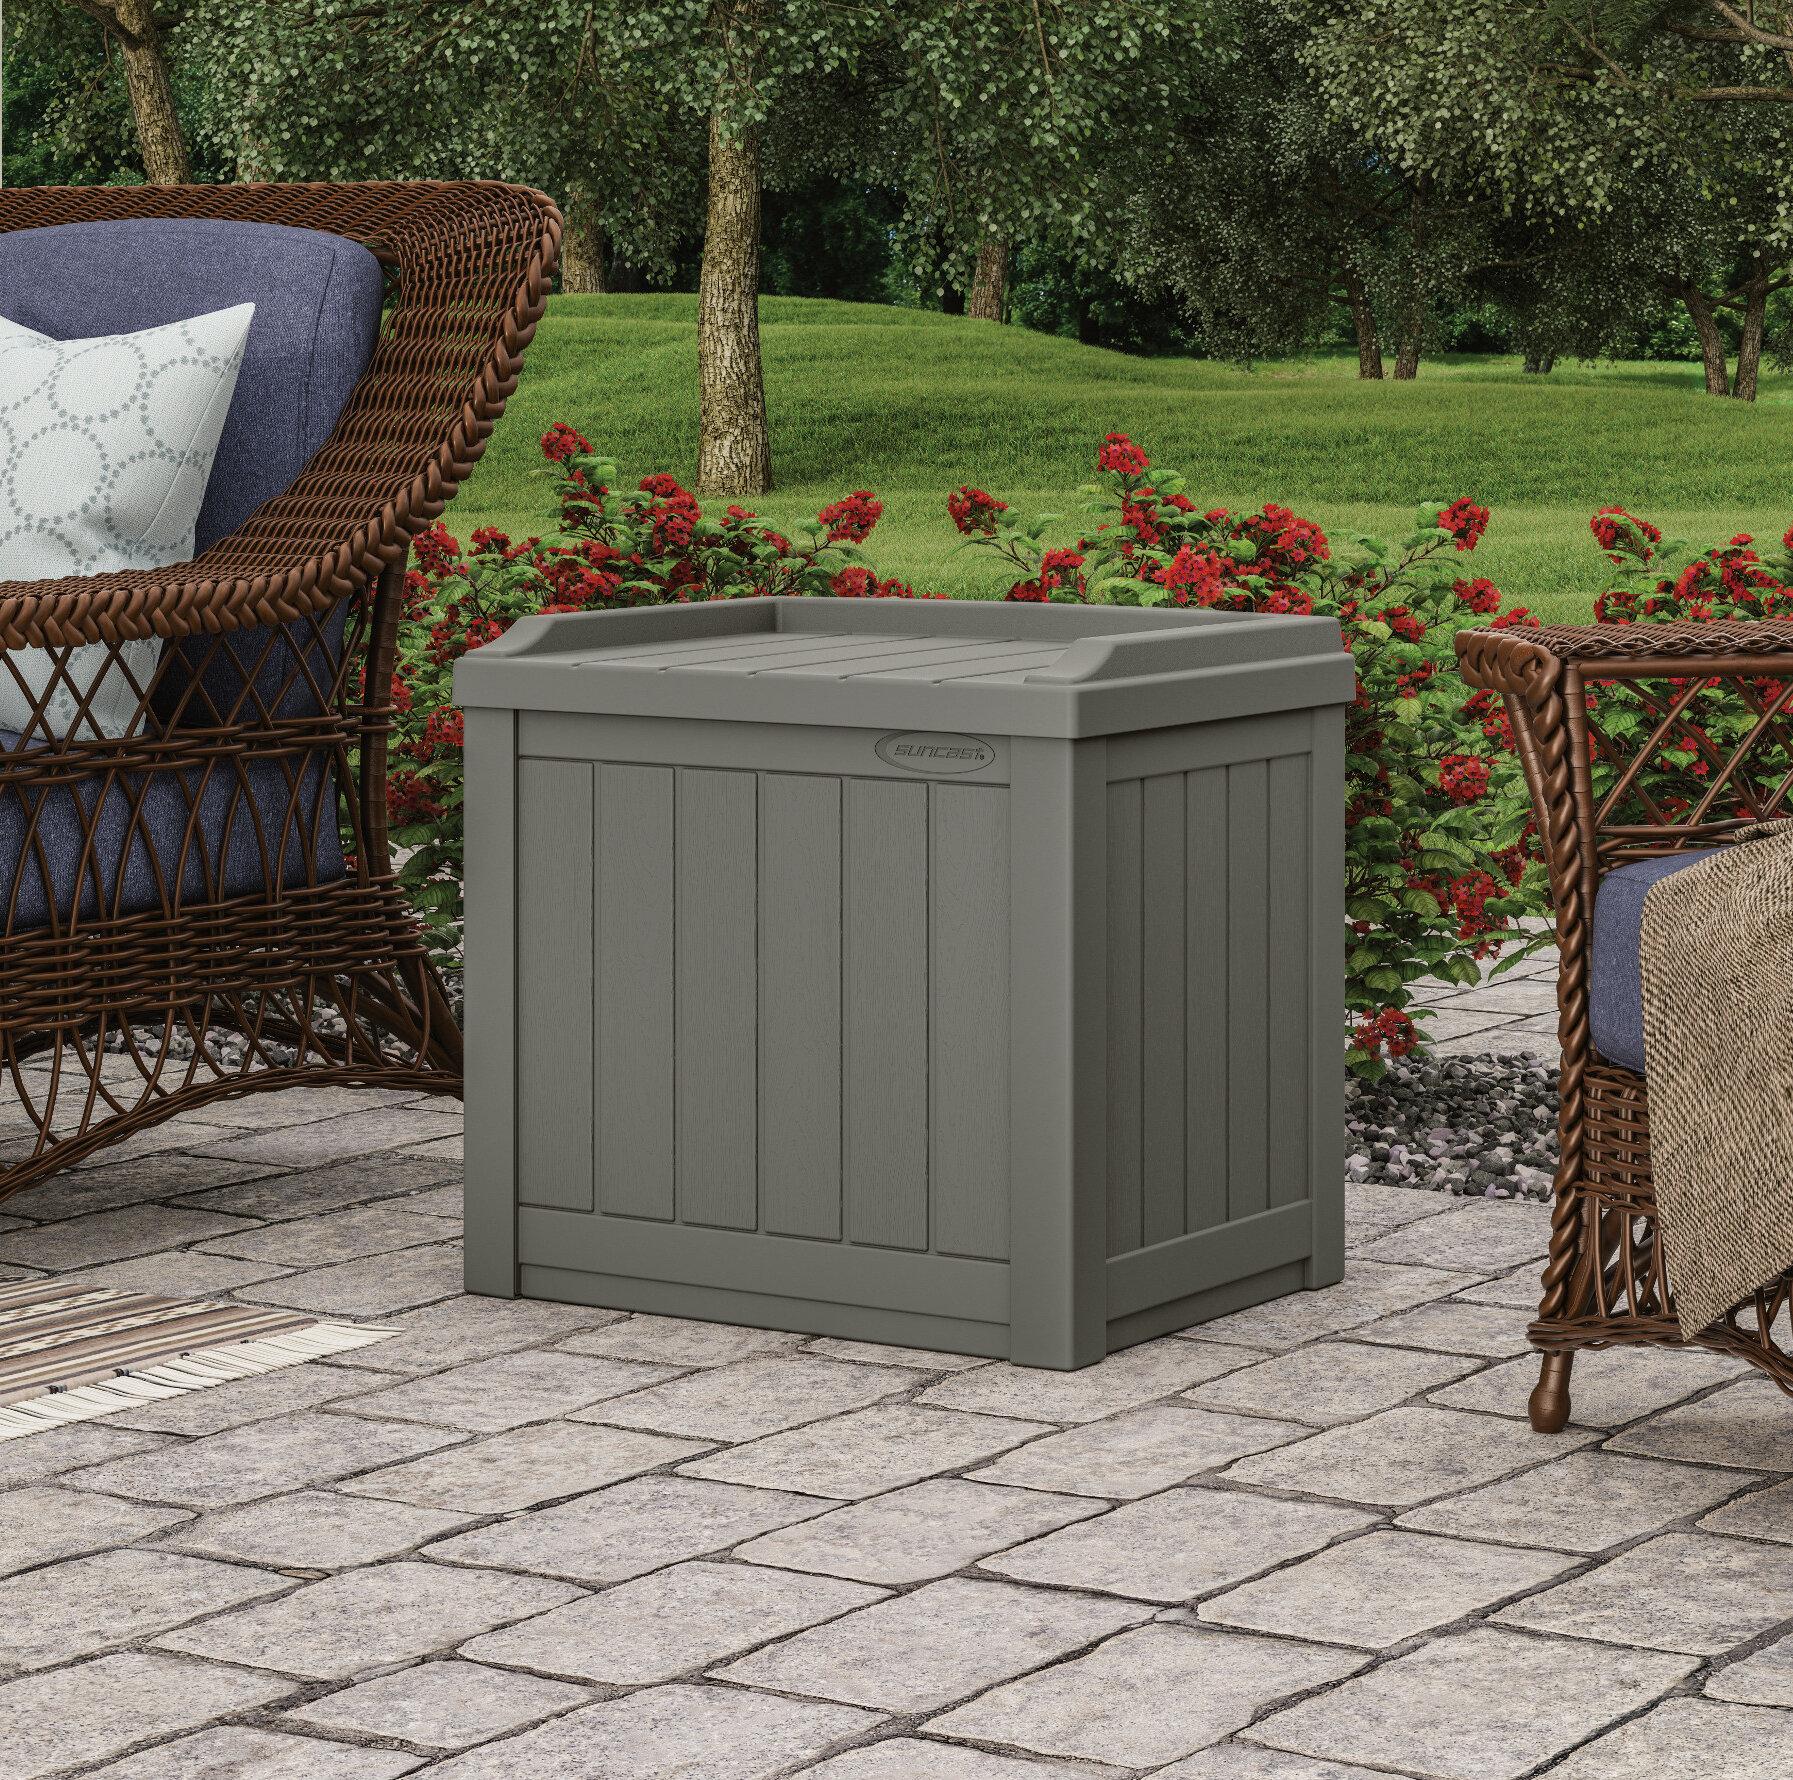 Phenomenal 22 Gallon Plastic Resin Storage Bench Dailytribune Chair Design For Home Dailytribuneorg